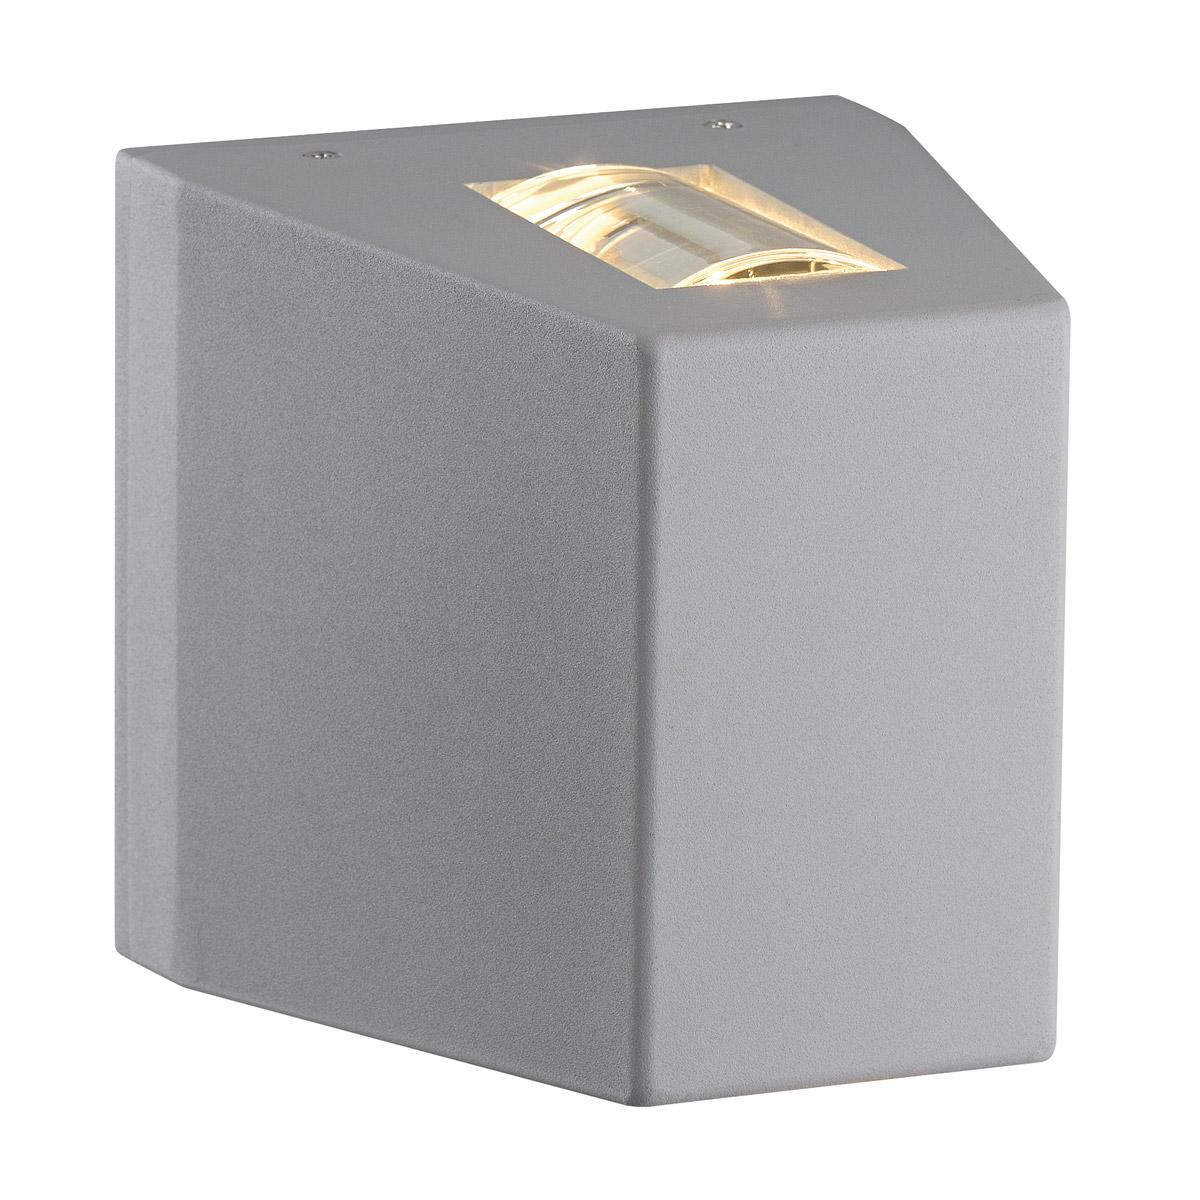 1 Stk OUT BEAM LED Wandleuchte, silbergrau, NUR BEAM LI229684--